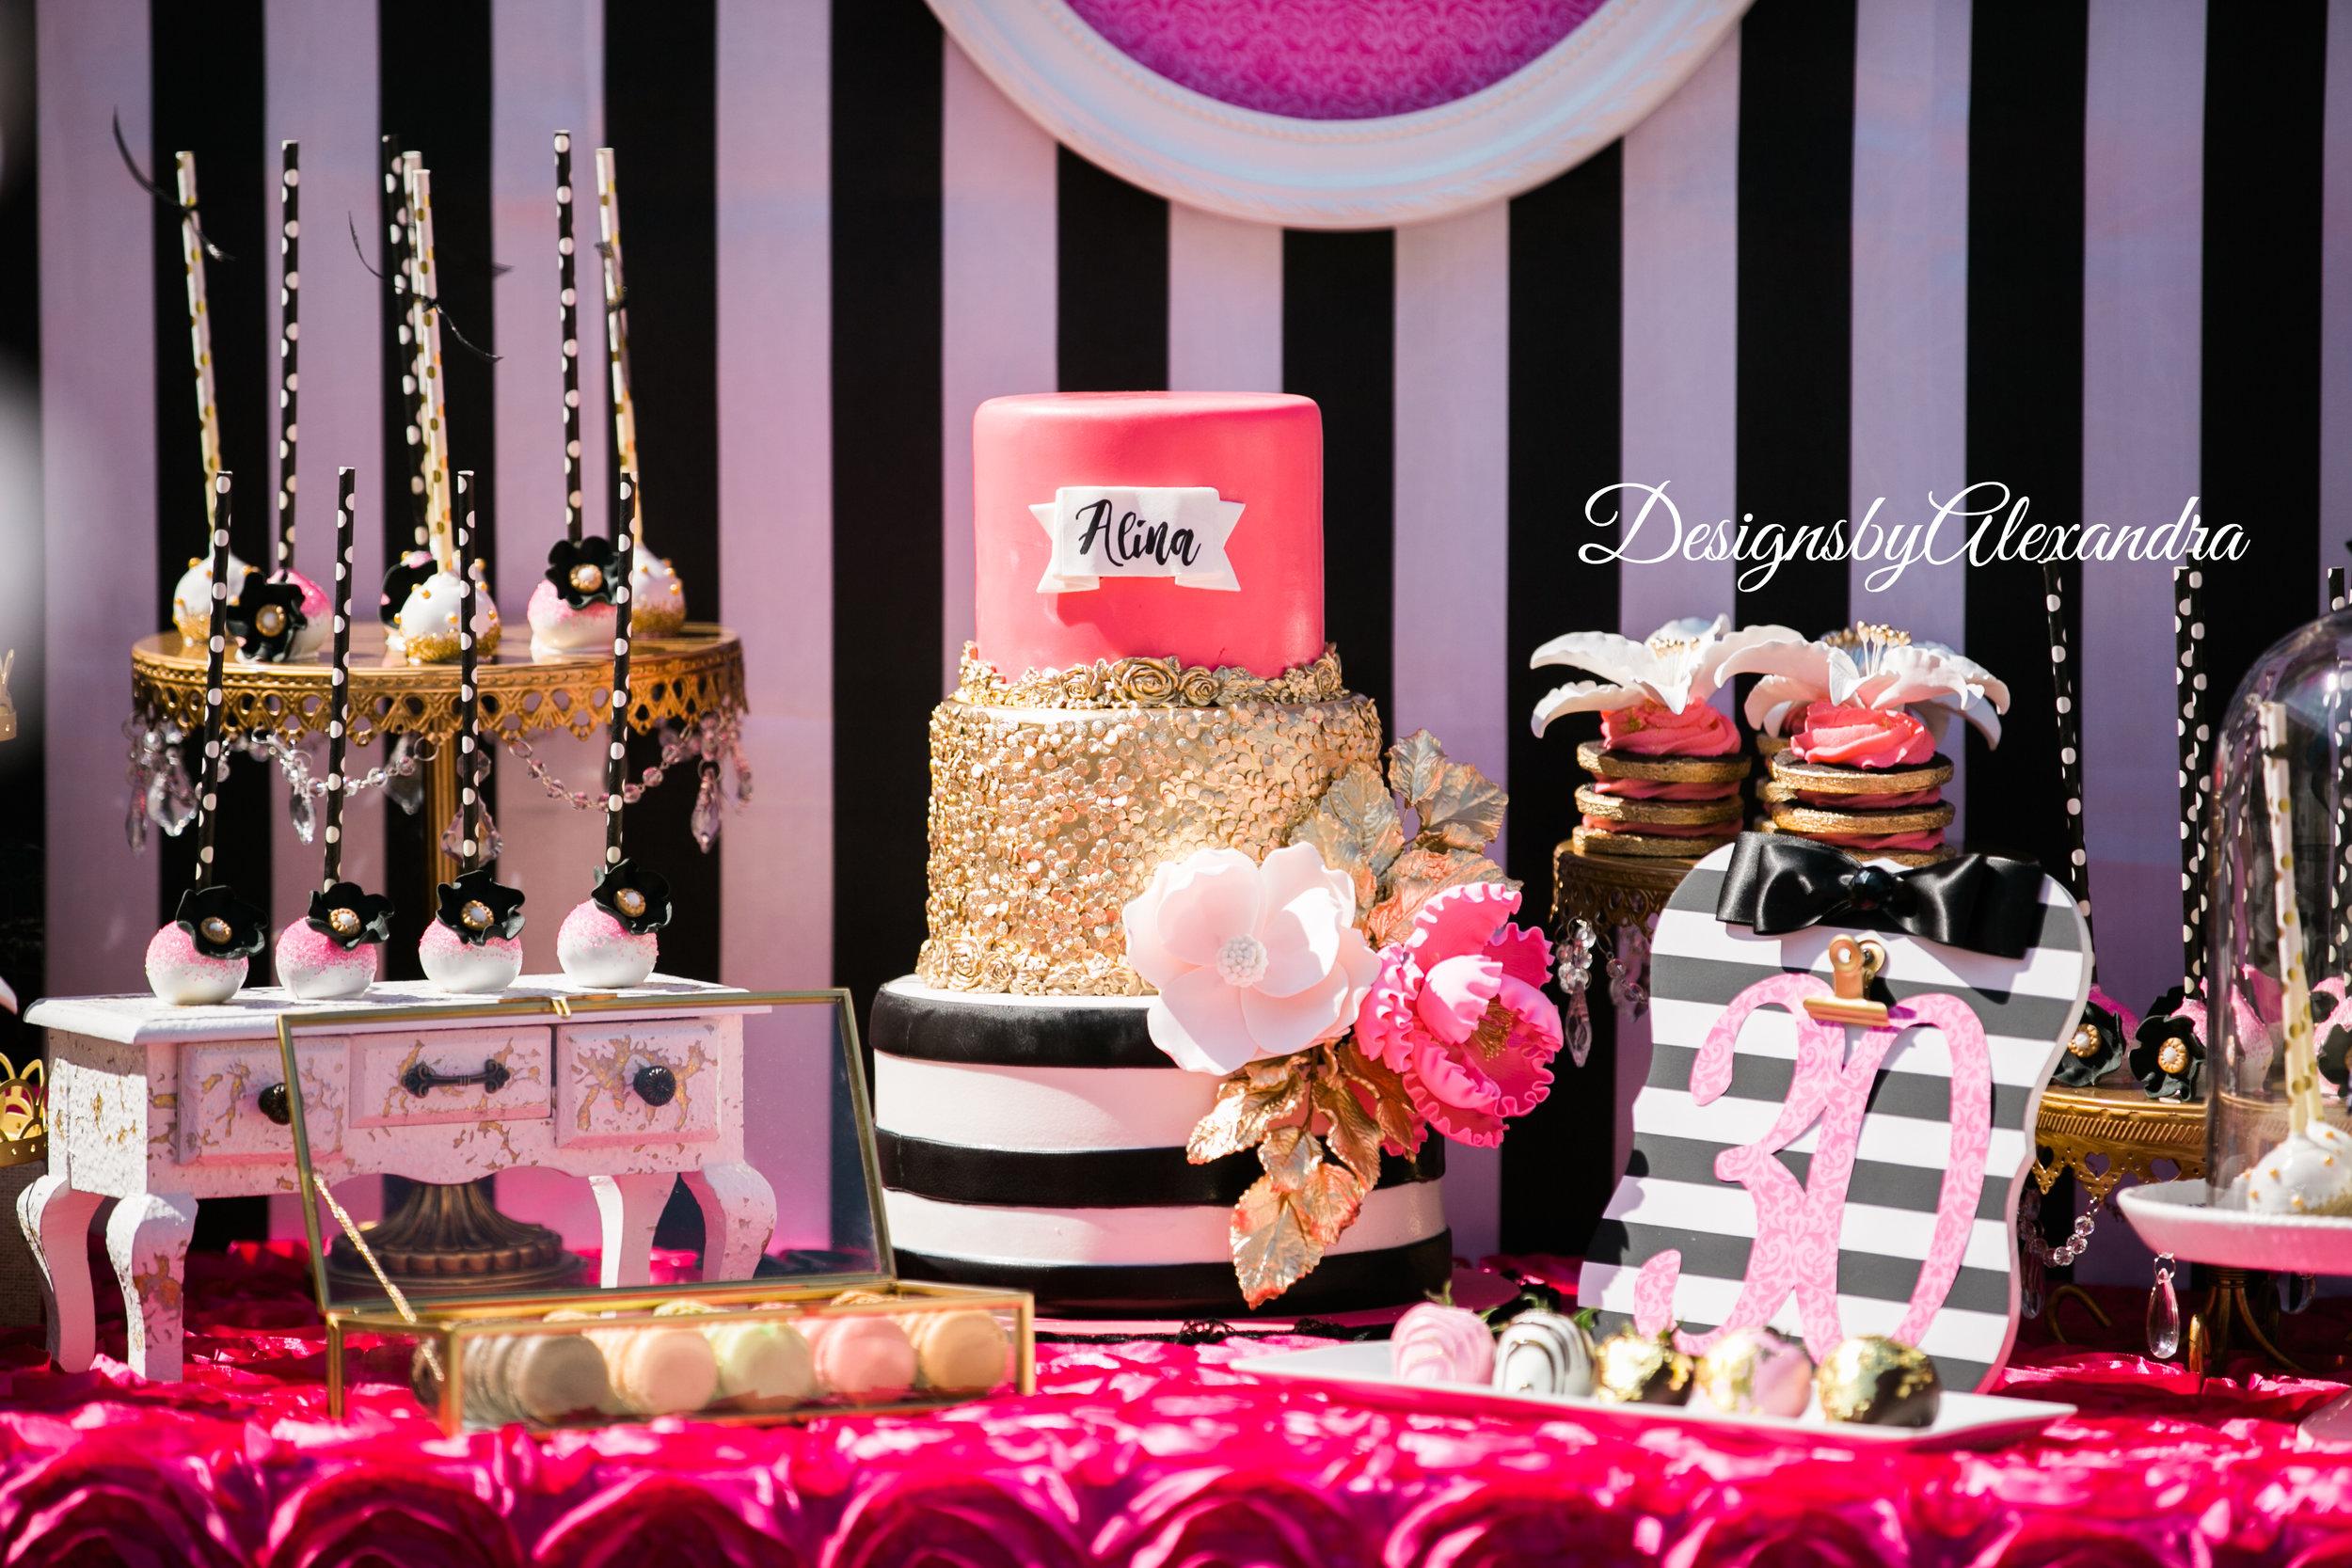 gold-chandelier-cakestand-pink-black-Birthday-designsbyalexandra.JPG